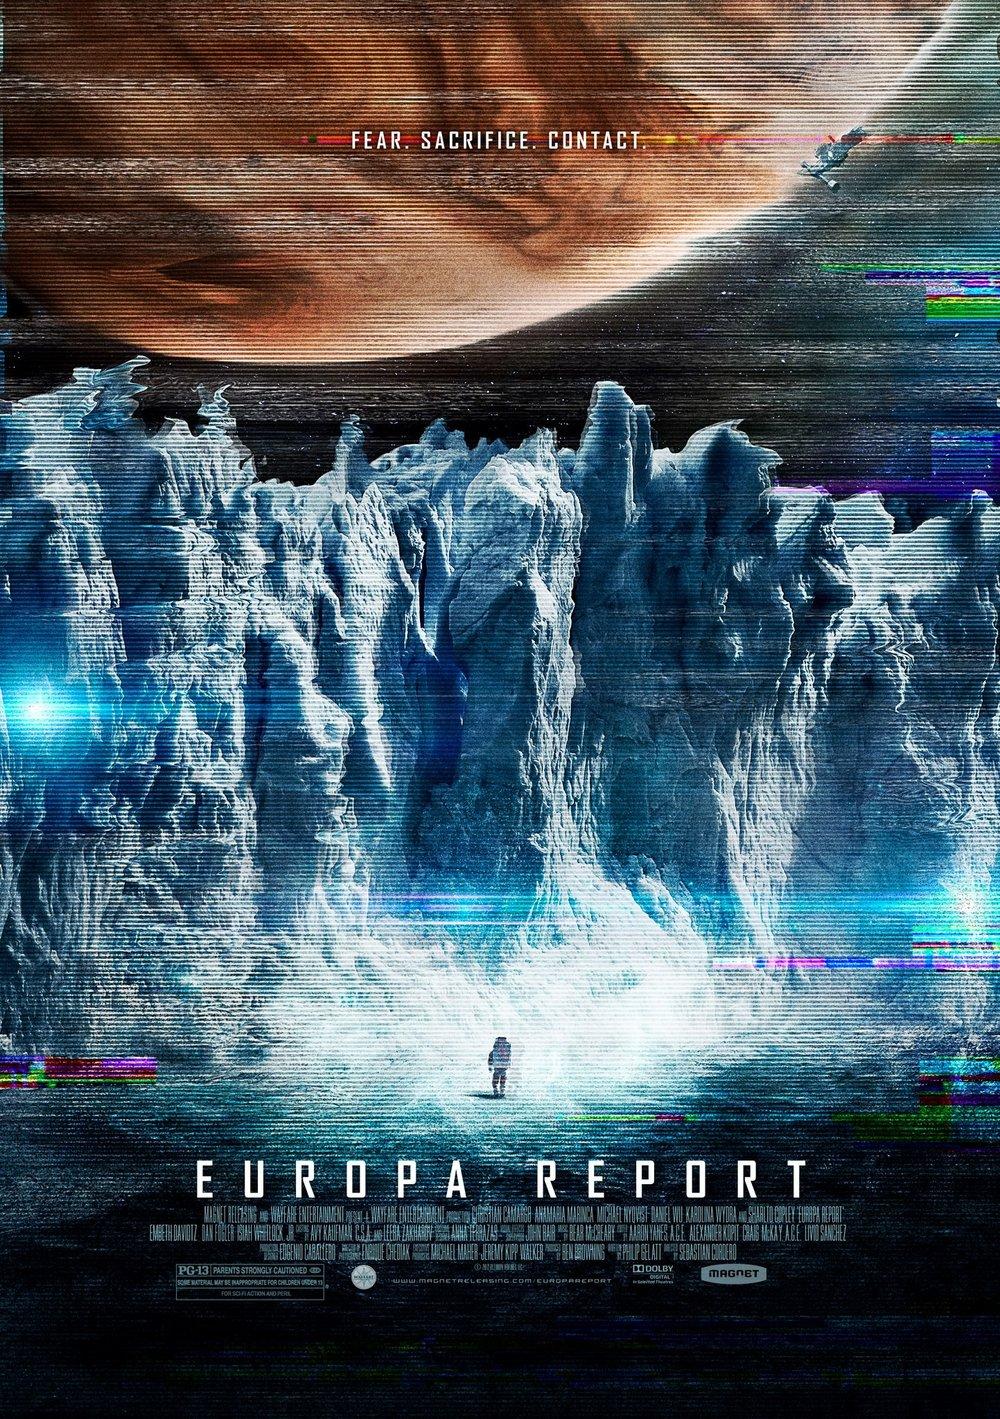 europa_report_xxlg.jpg